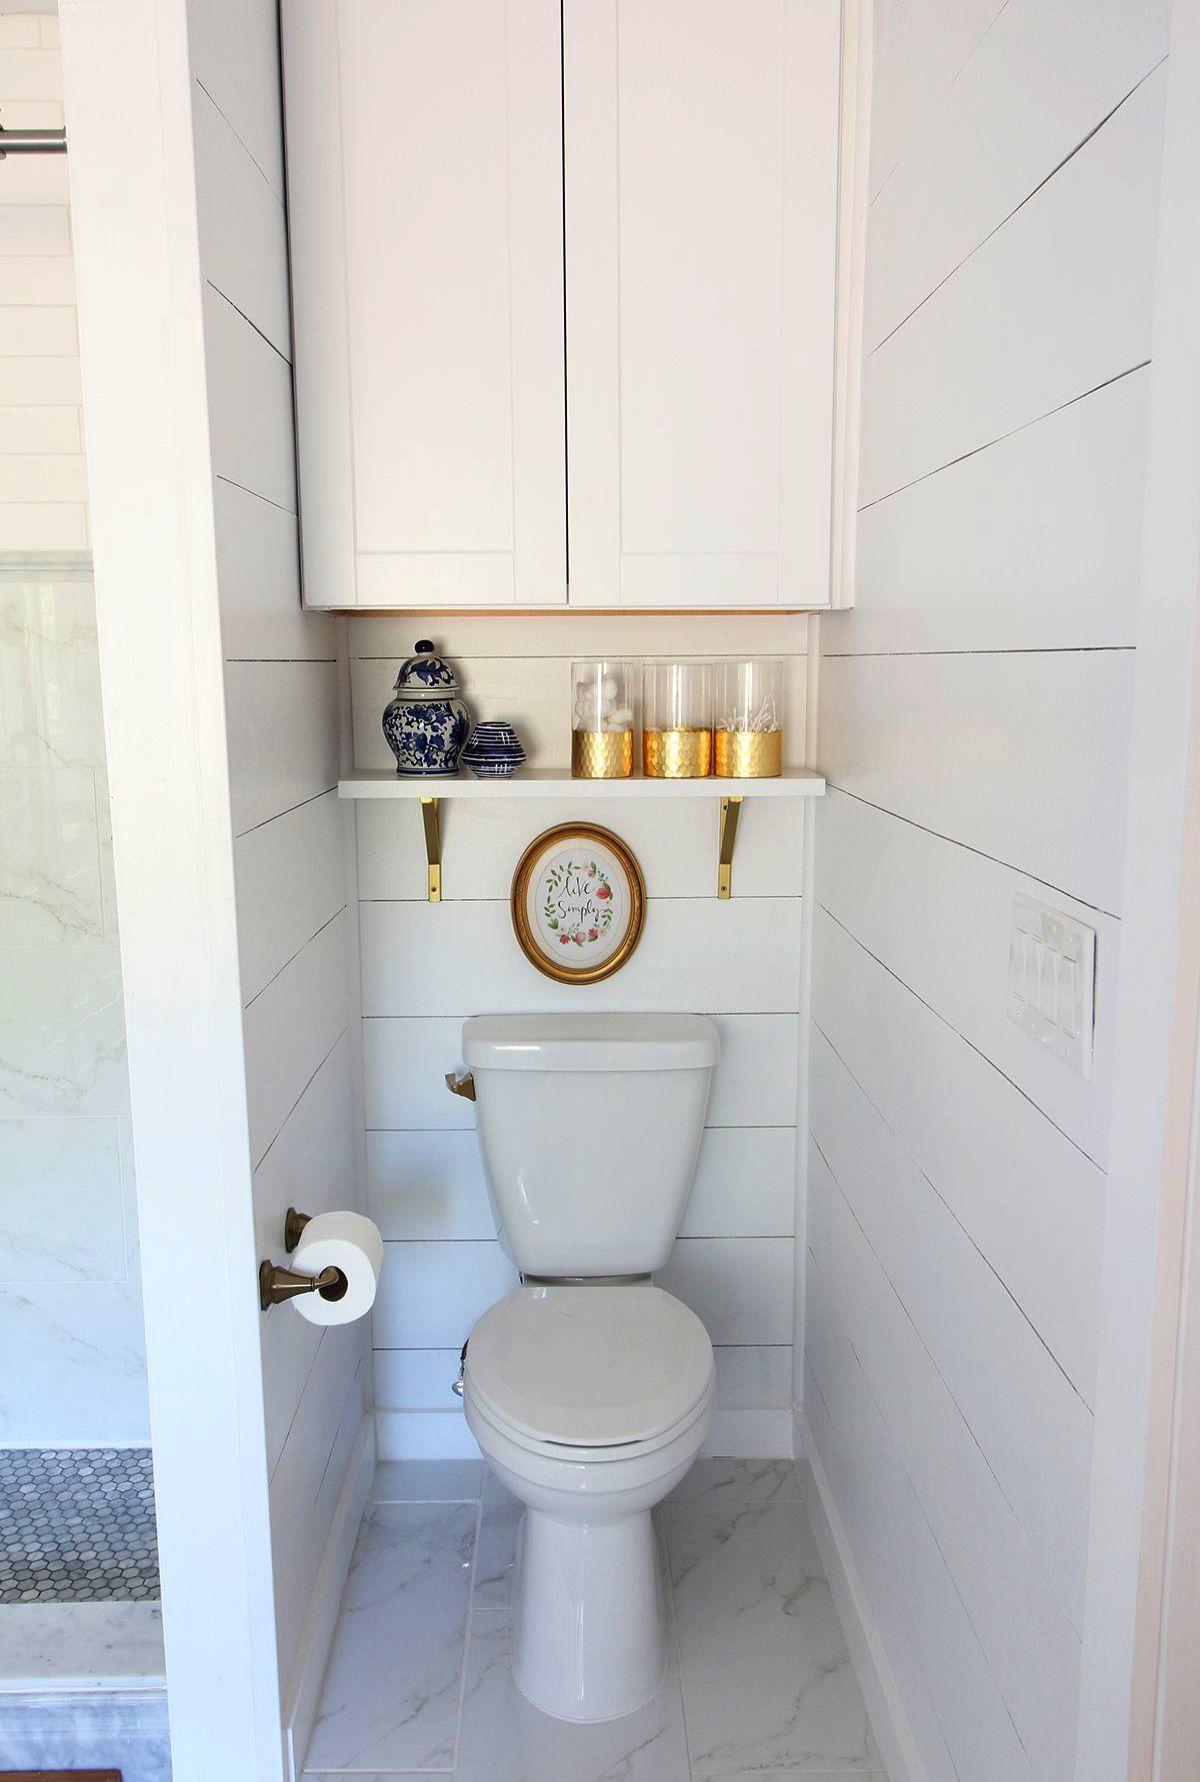 Bathroom Mirrors That Tilt These Inexpensive Small Bathroom Remodel Ideas Among Bathroom Cabinets On The Top Bathroom Design Very Small Bathroom Closet Layout [ jpg ]